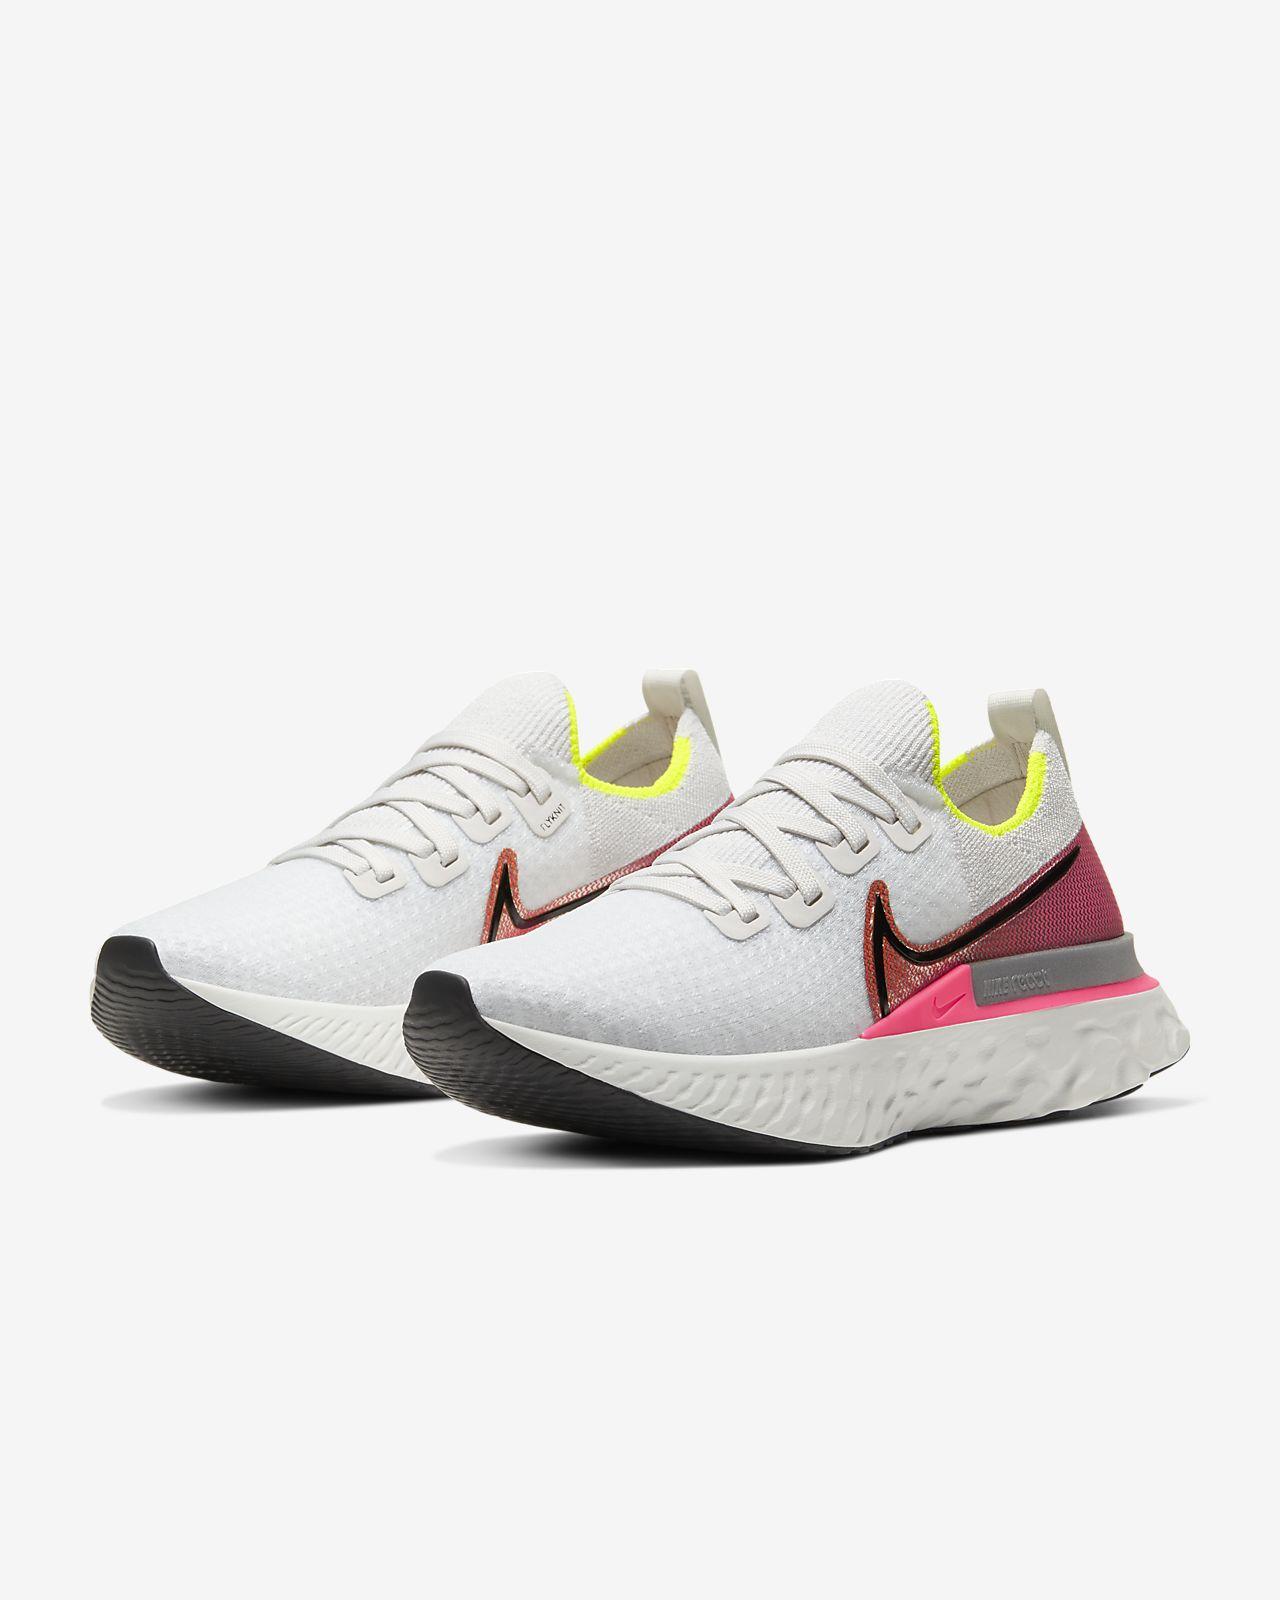 Nike React Infinity Run Flyknit Mens Running Shoes